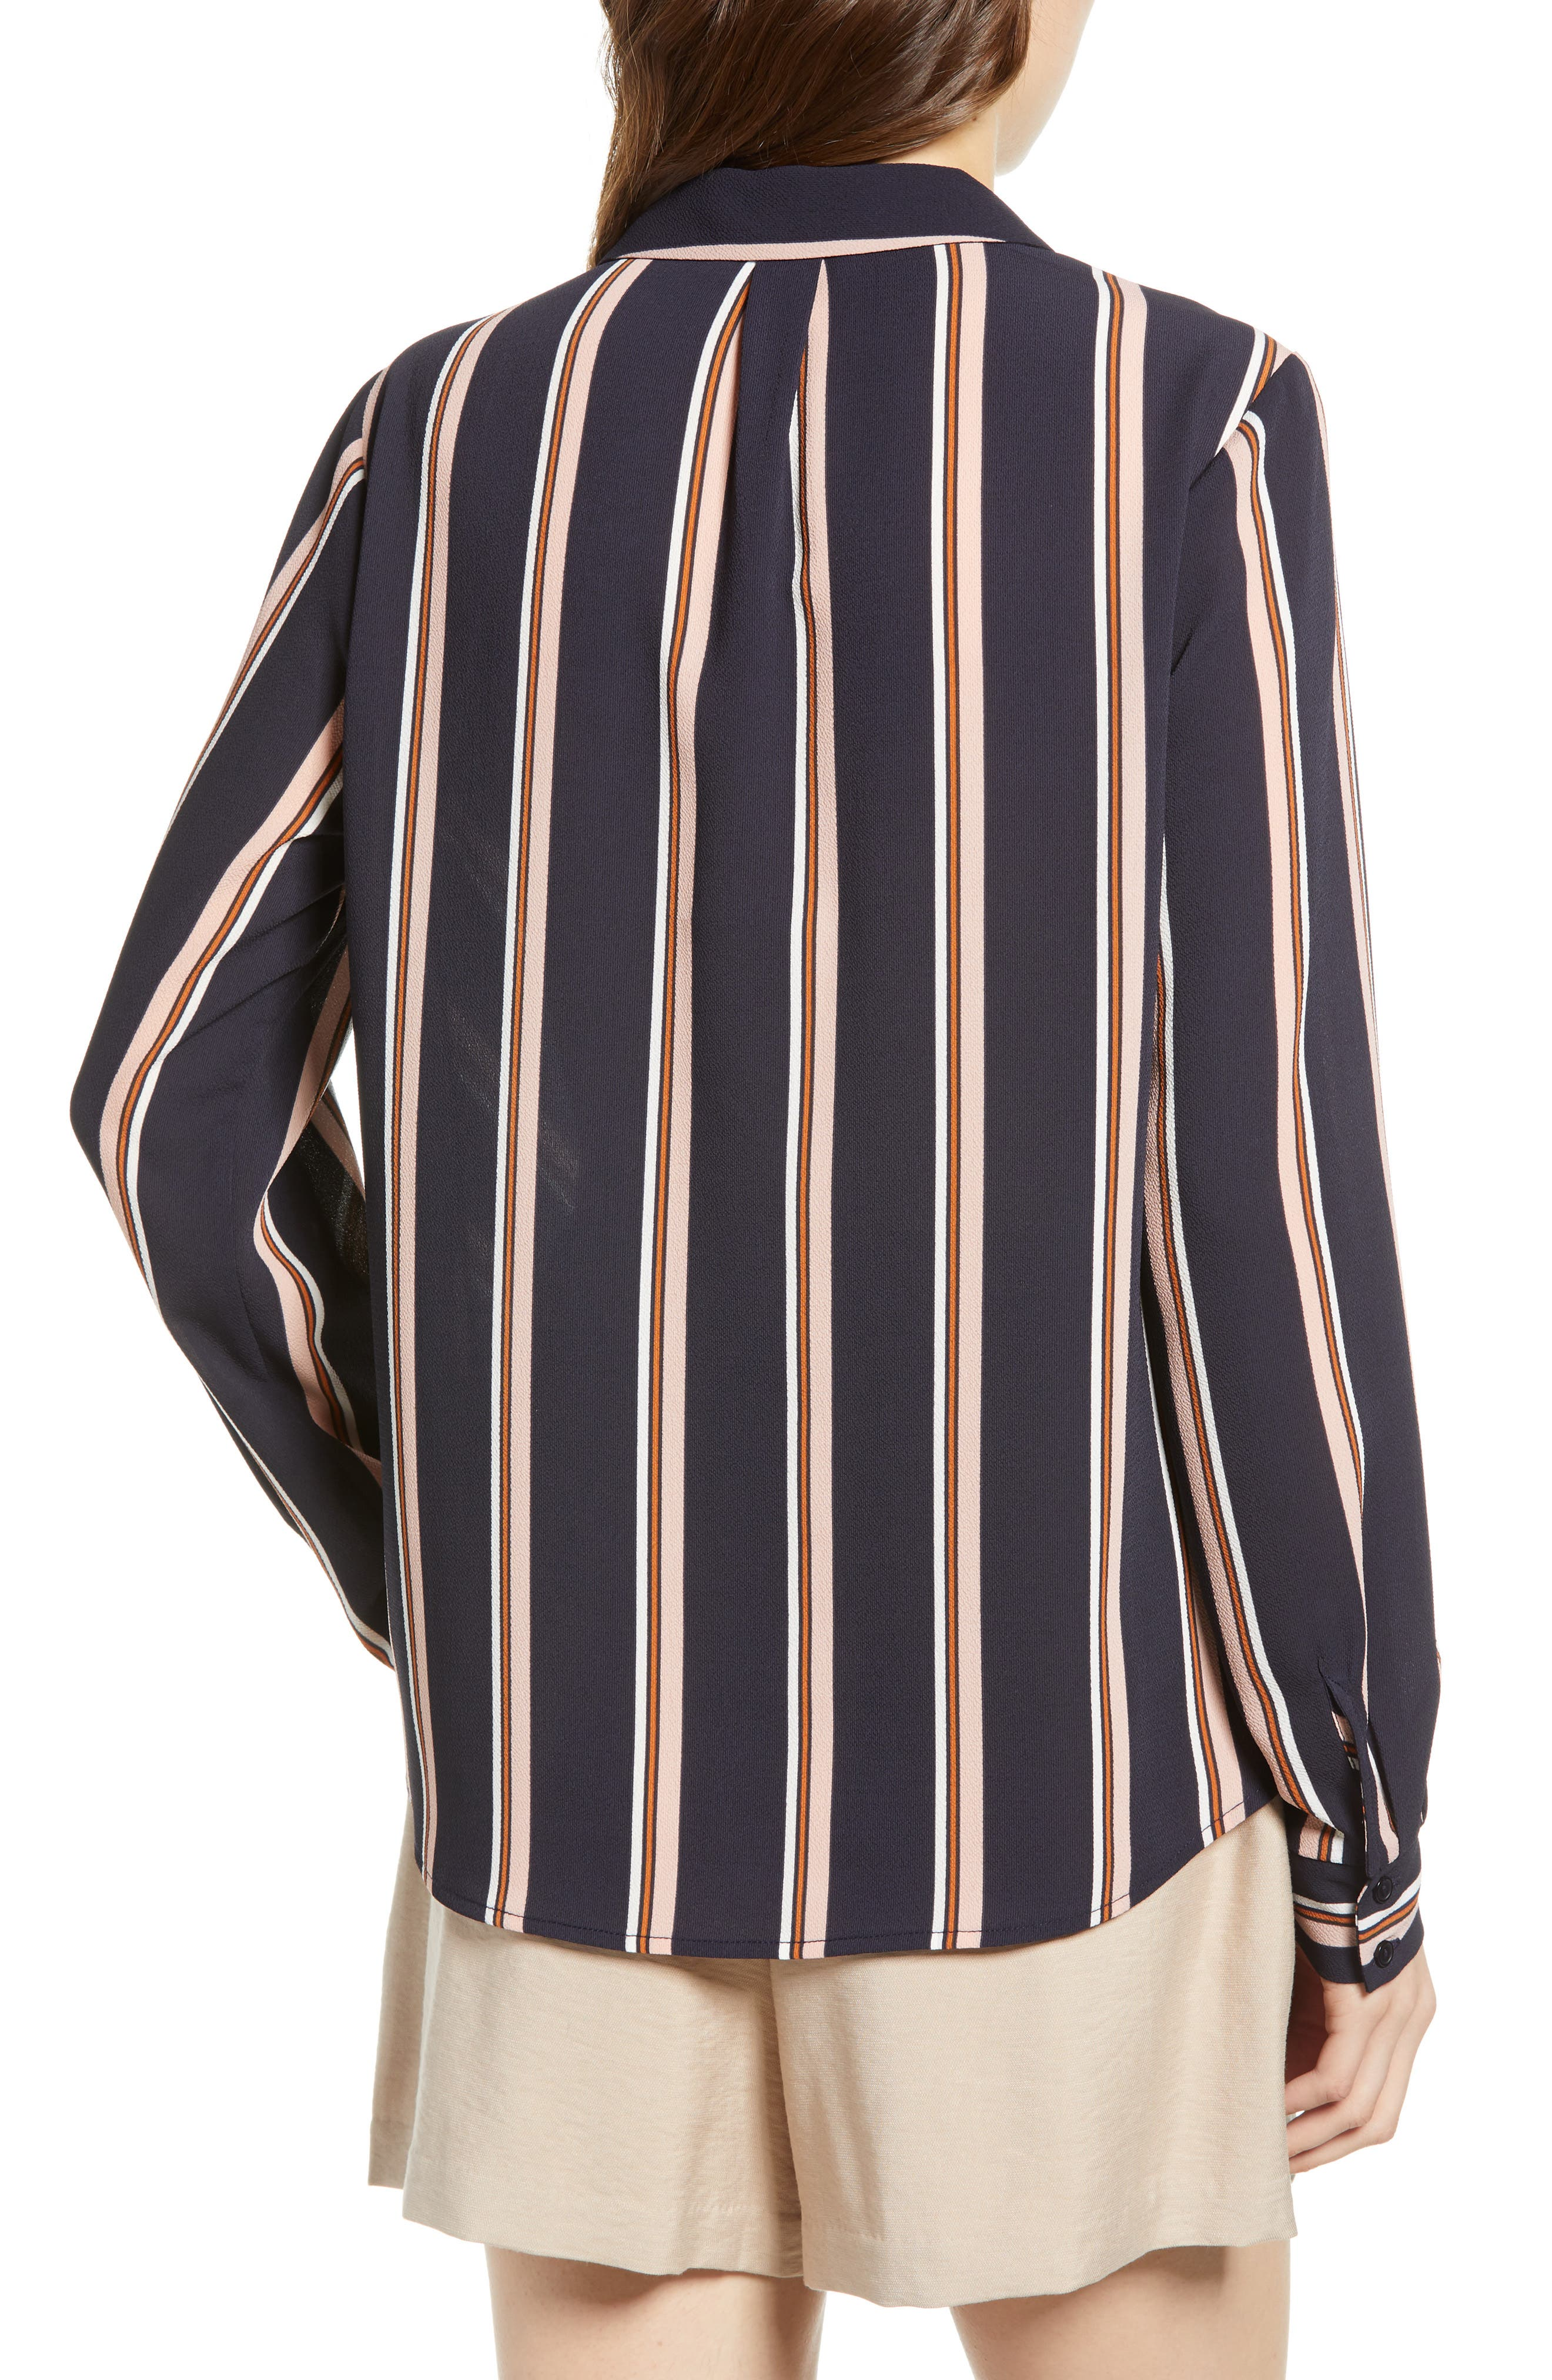 ALL IN FAVOR, Patterned Drape Front Blouse, Alternate thumbnail 2, color, NAVY STRIPE